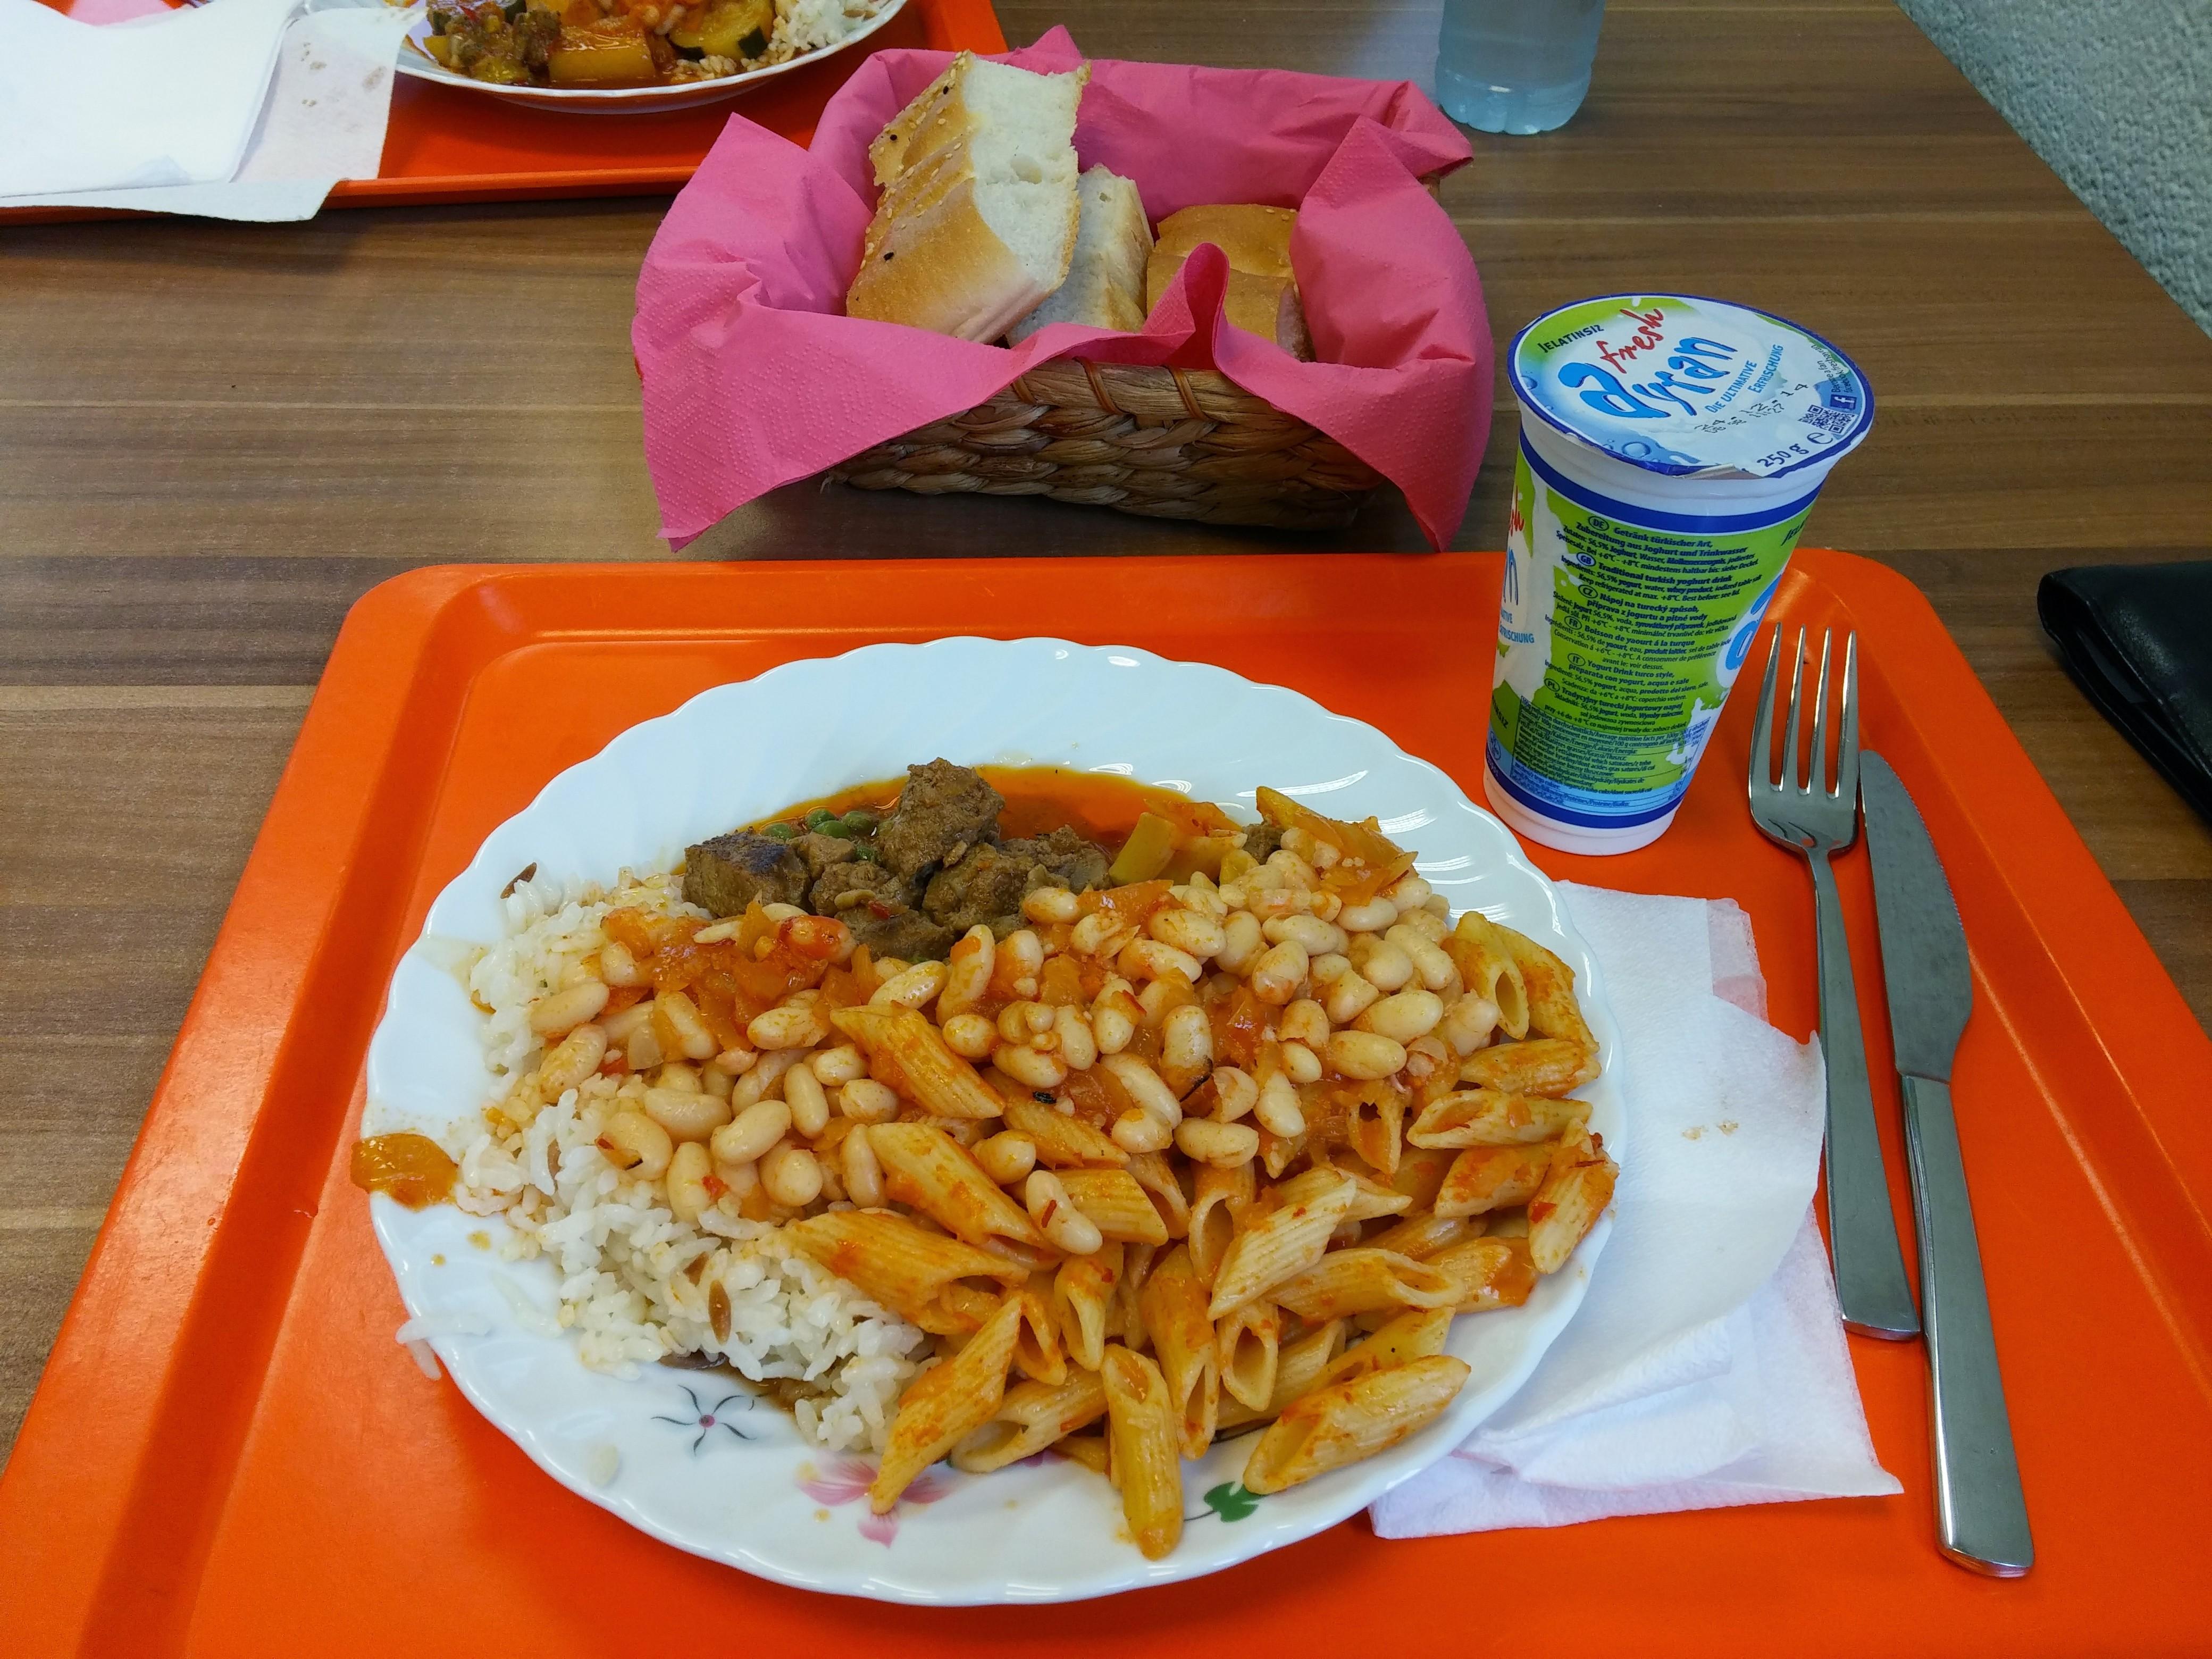 https://foodloader.net/nico_2014-11-18_reis-rindfleisch-kichererbsen-nudeln-brot.jpg